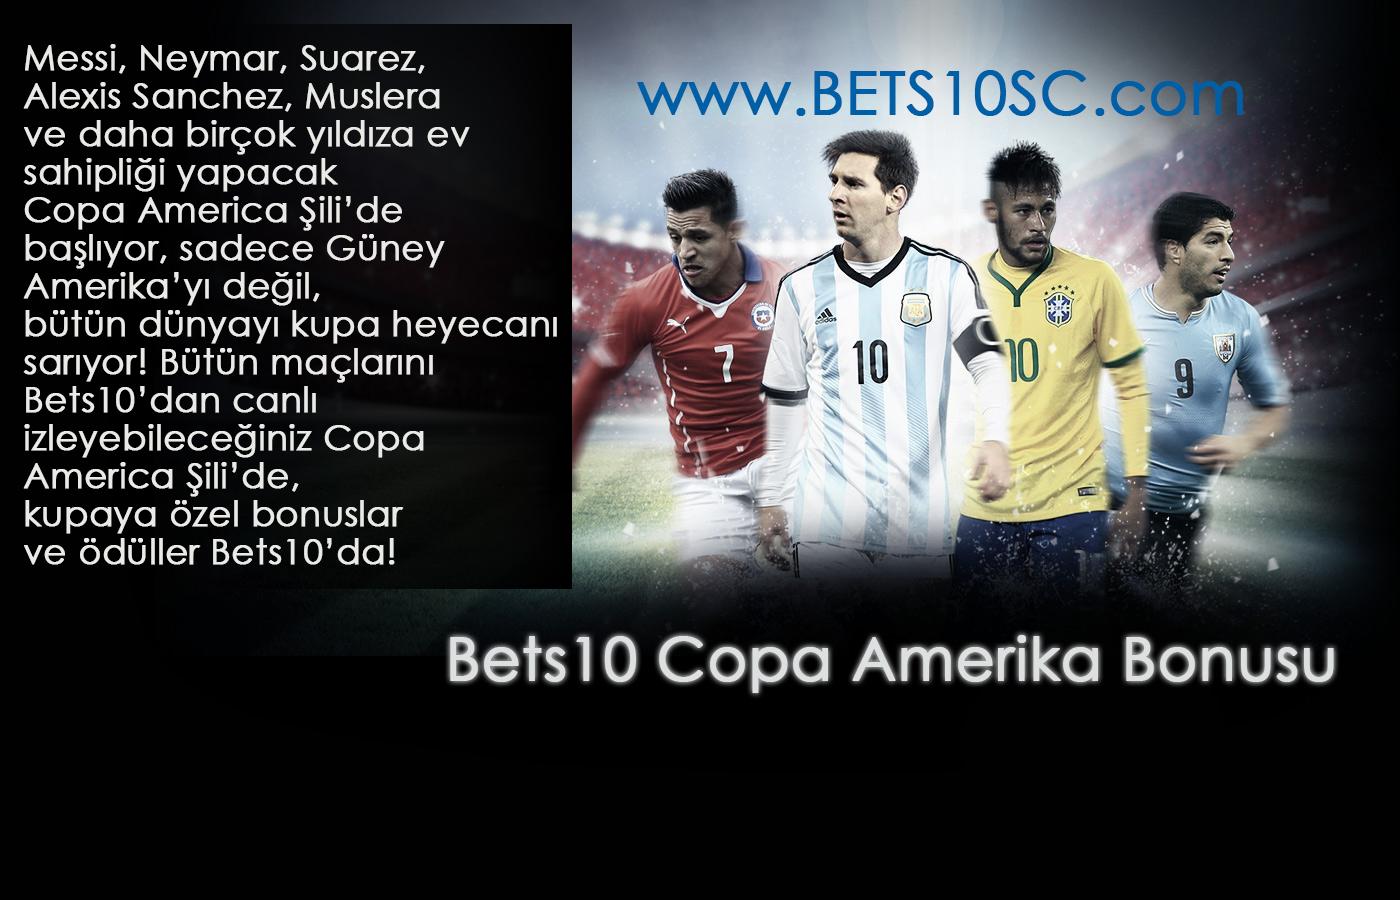 Bets10 Copa Amerika Bonusu